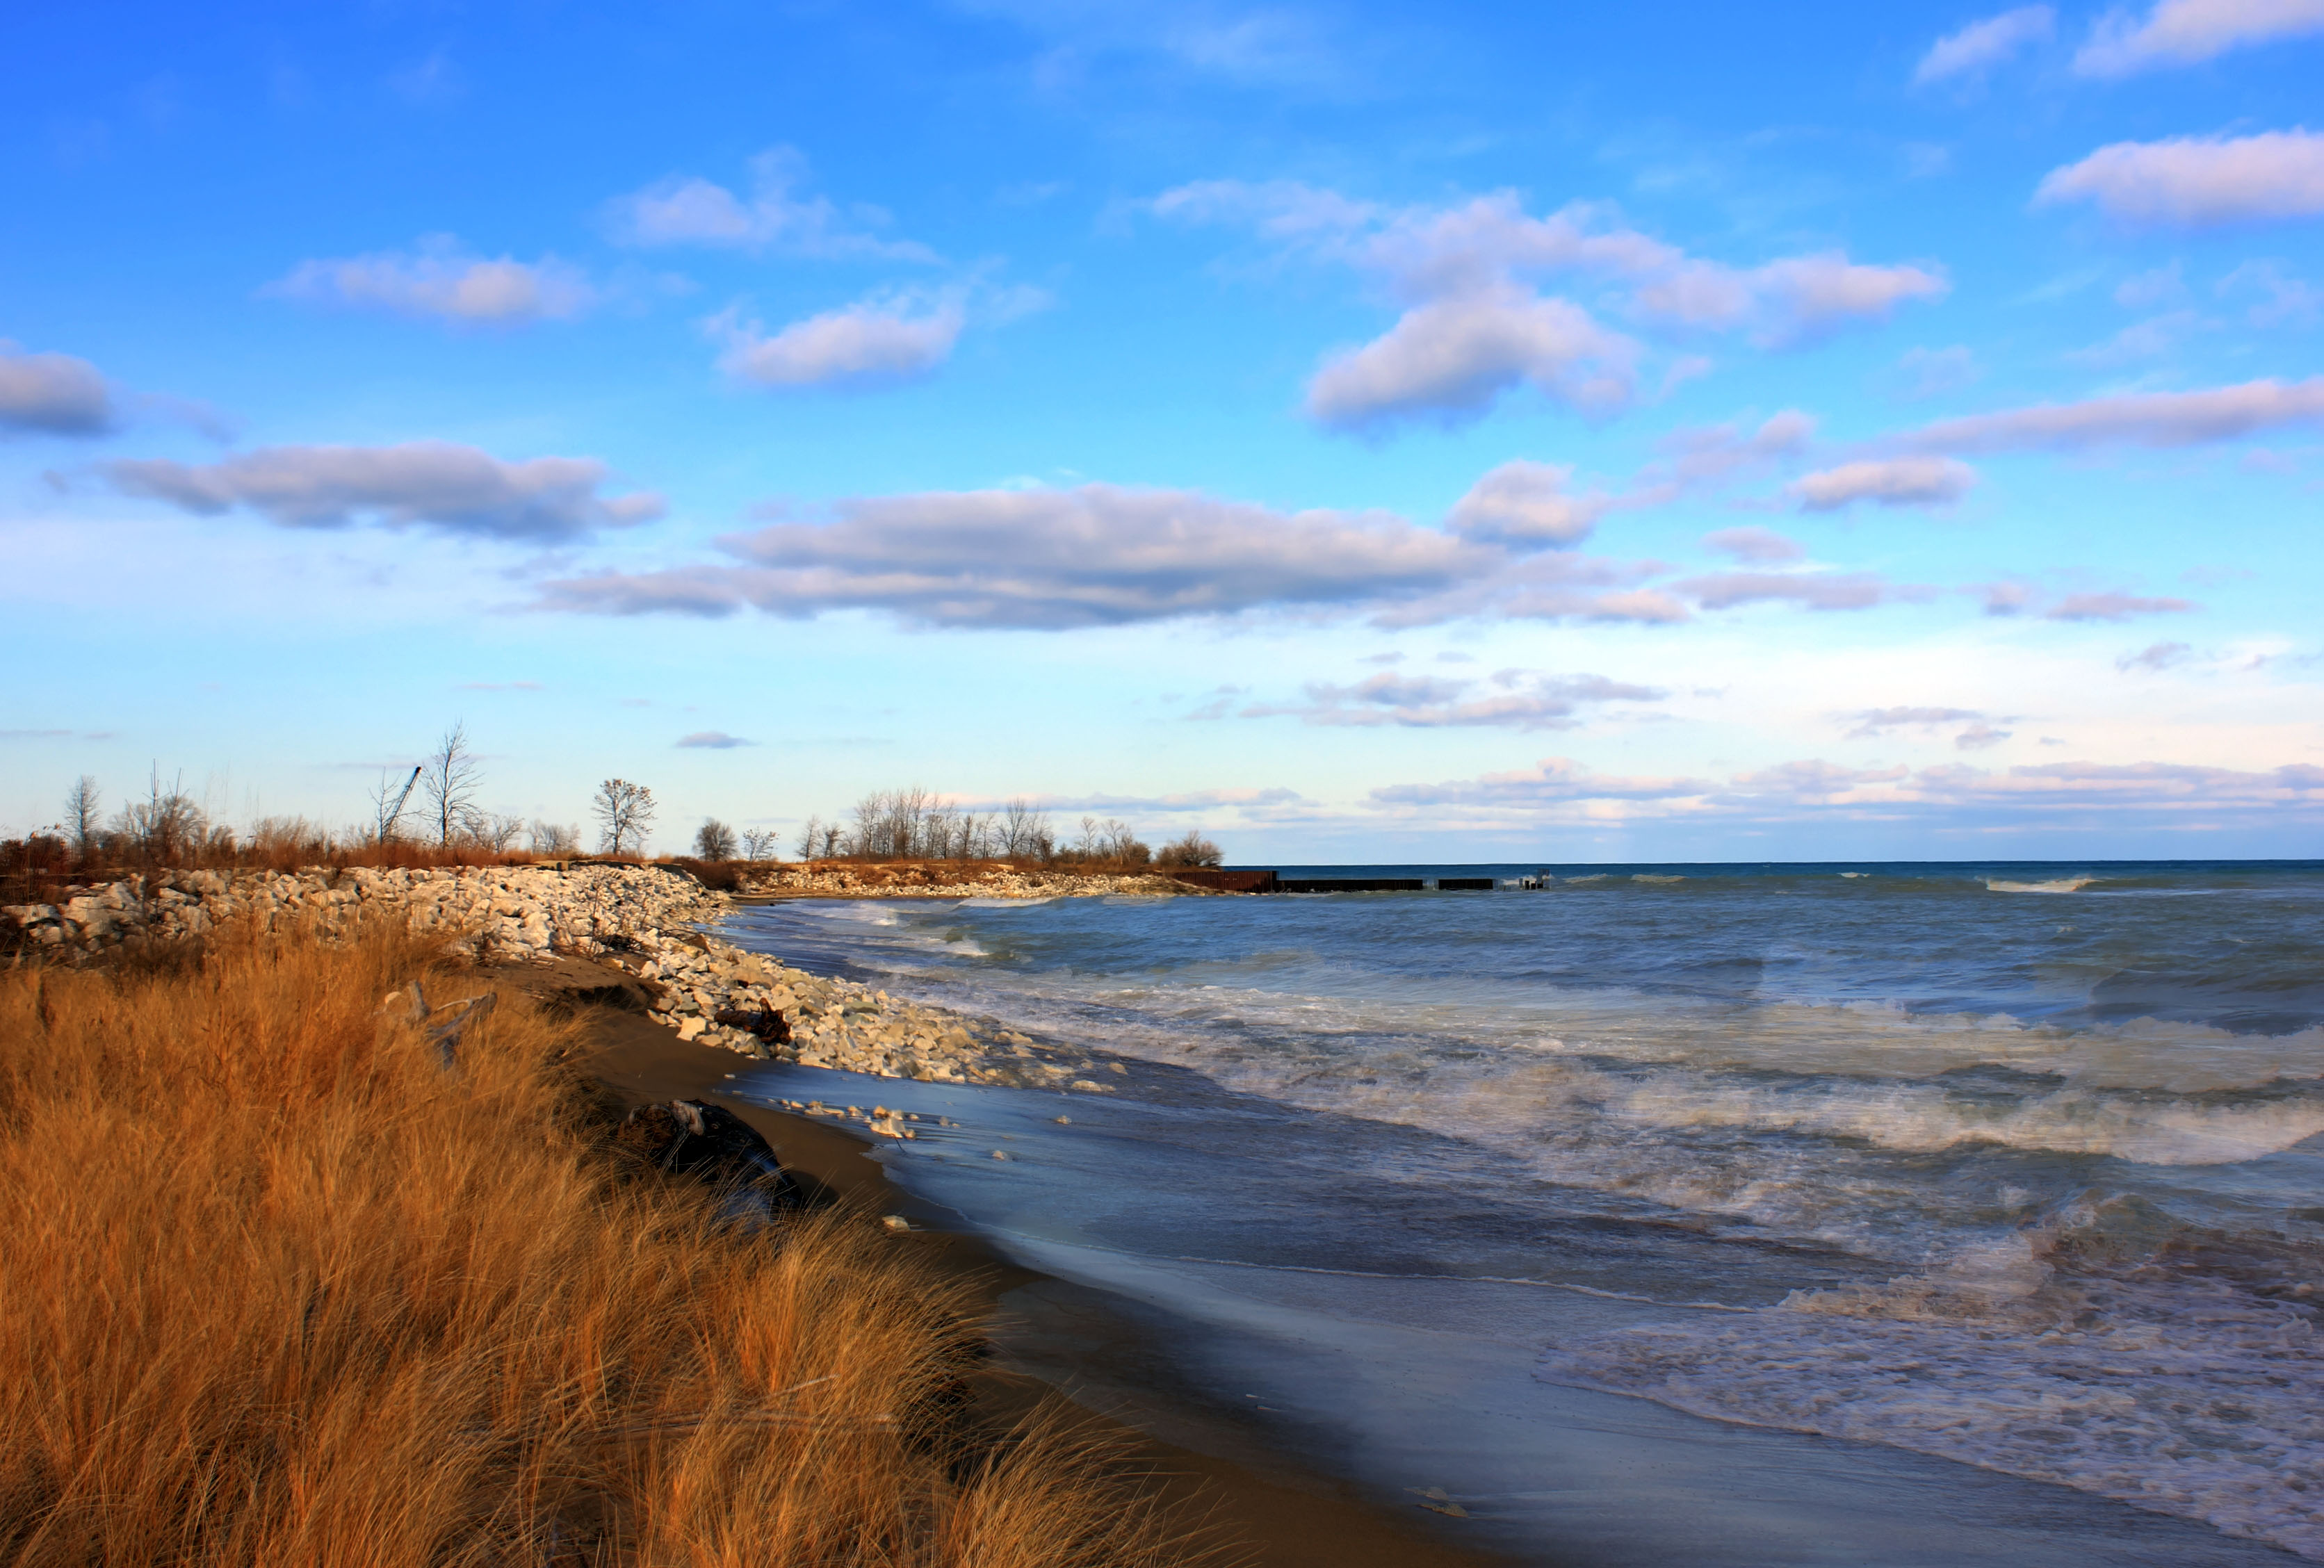 Illinois Beach State Park Wikipedia